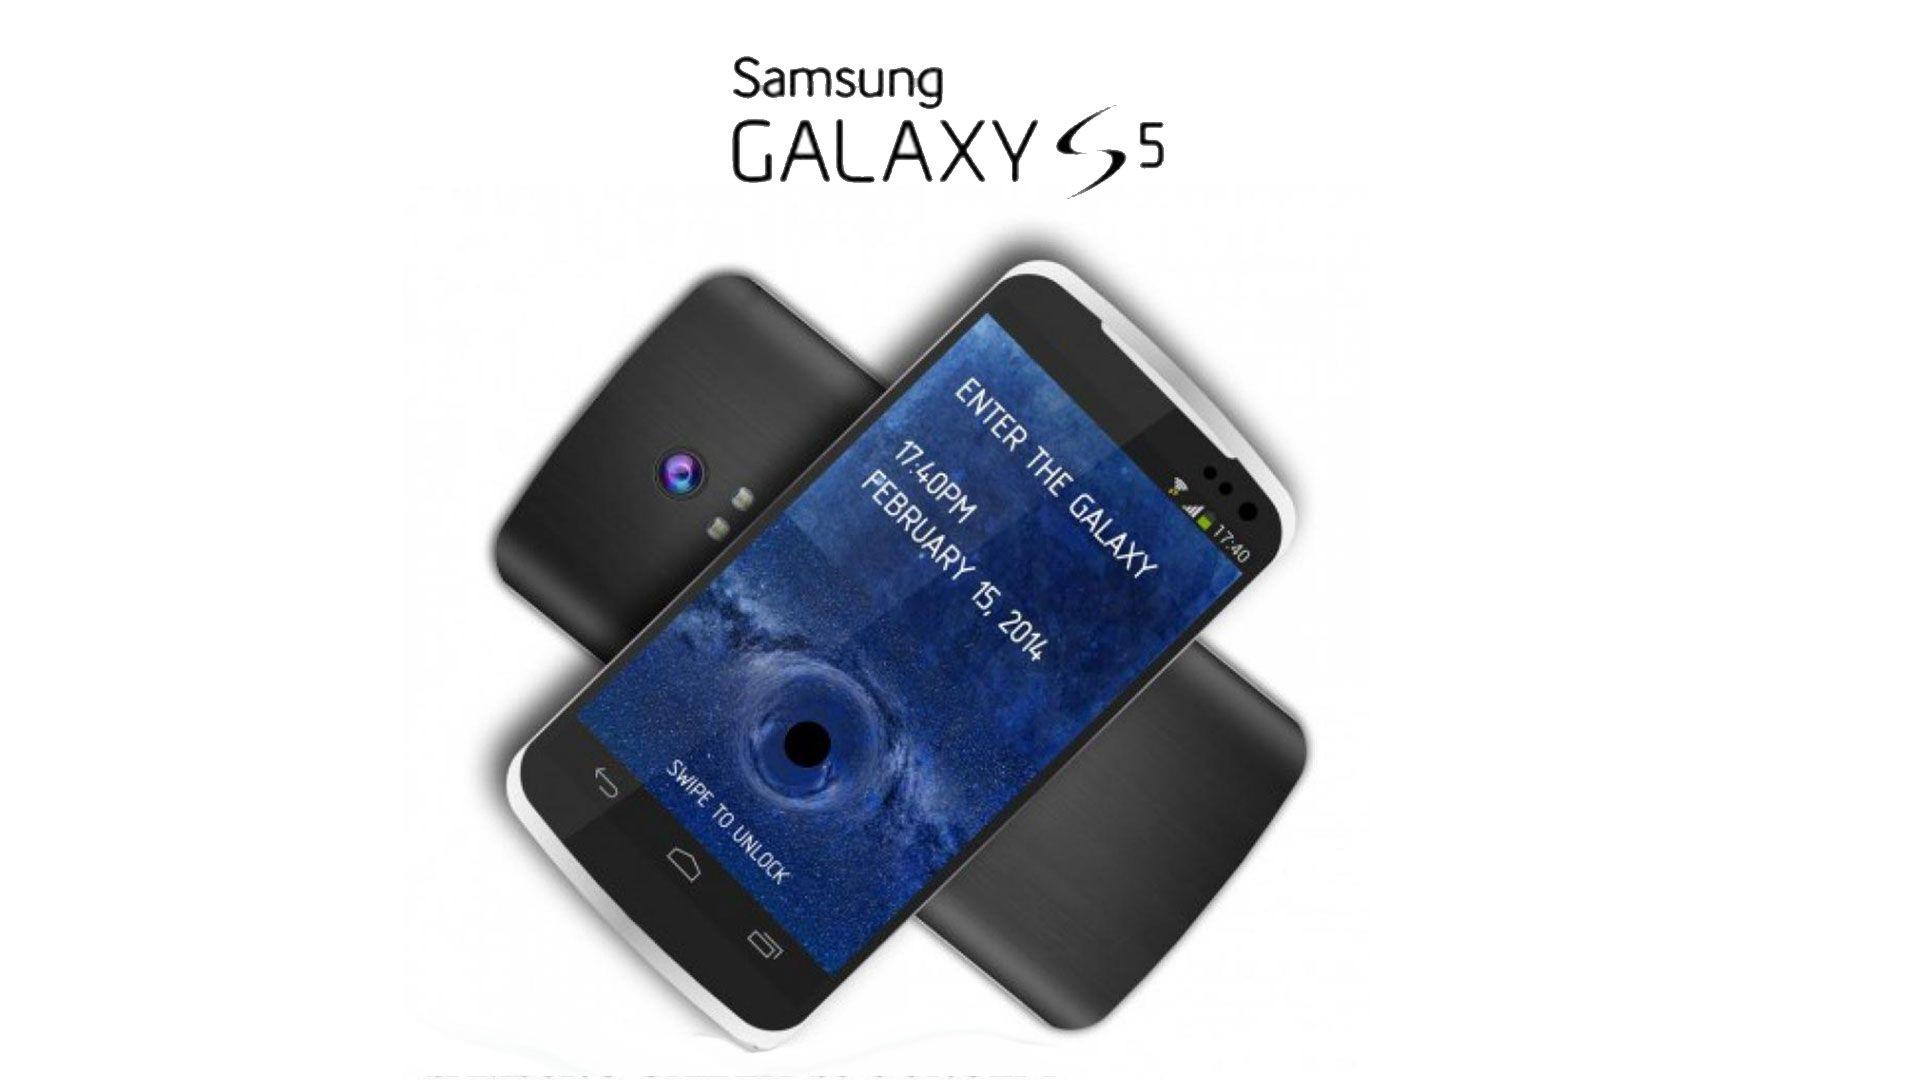 Фото телефона samsung galaxy s5 8